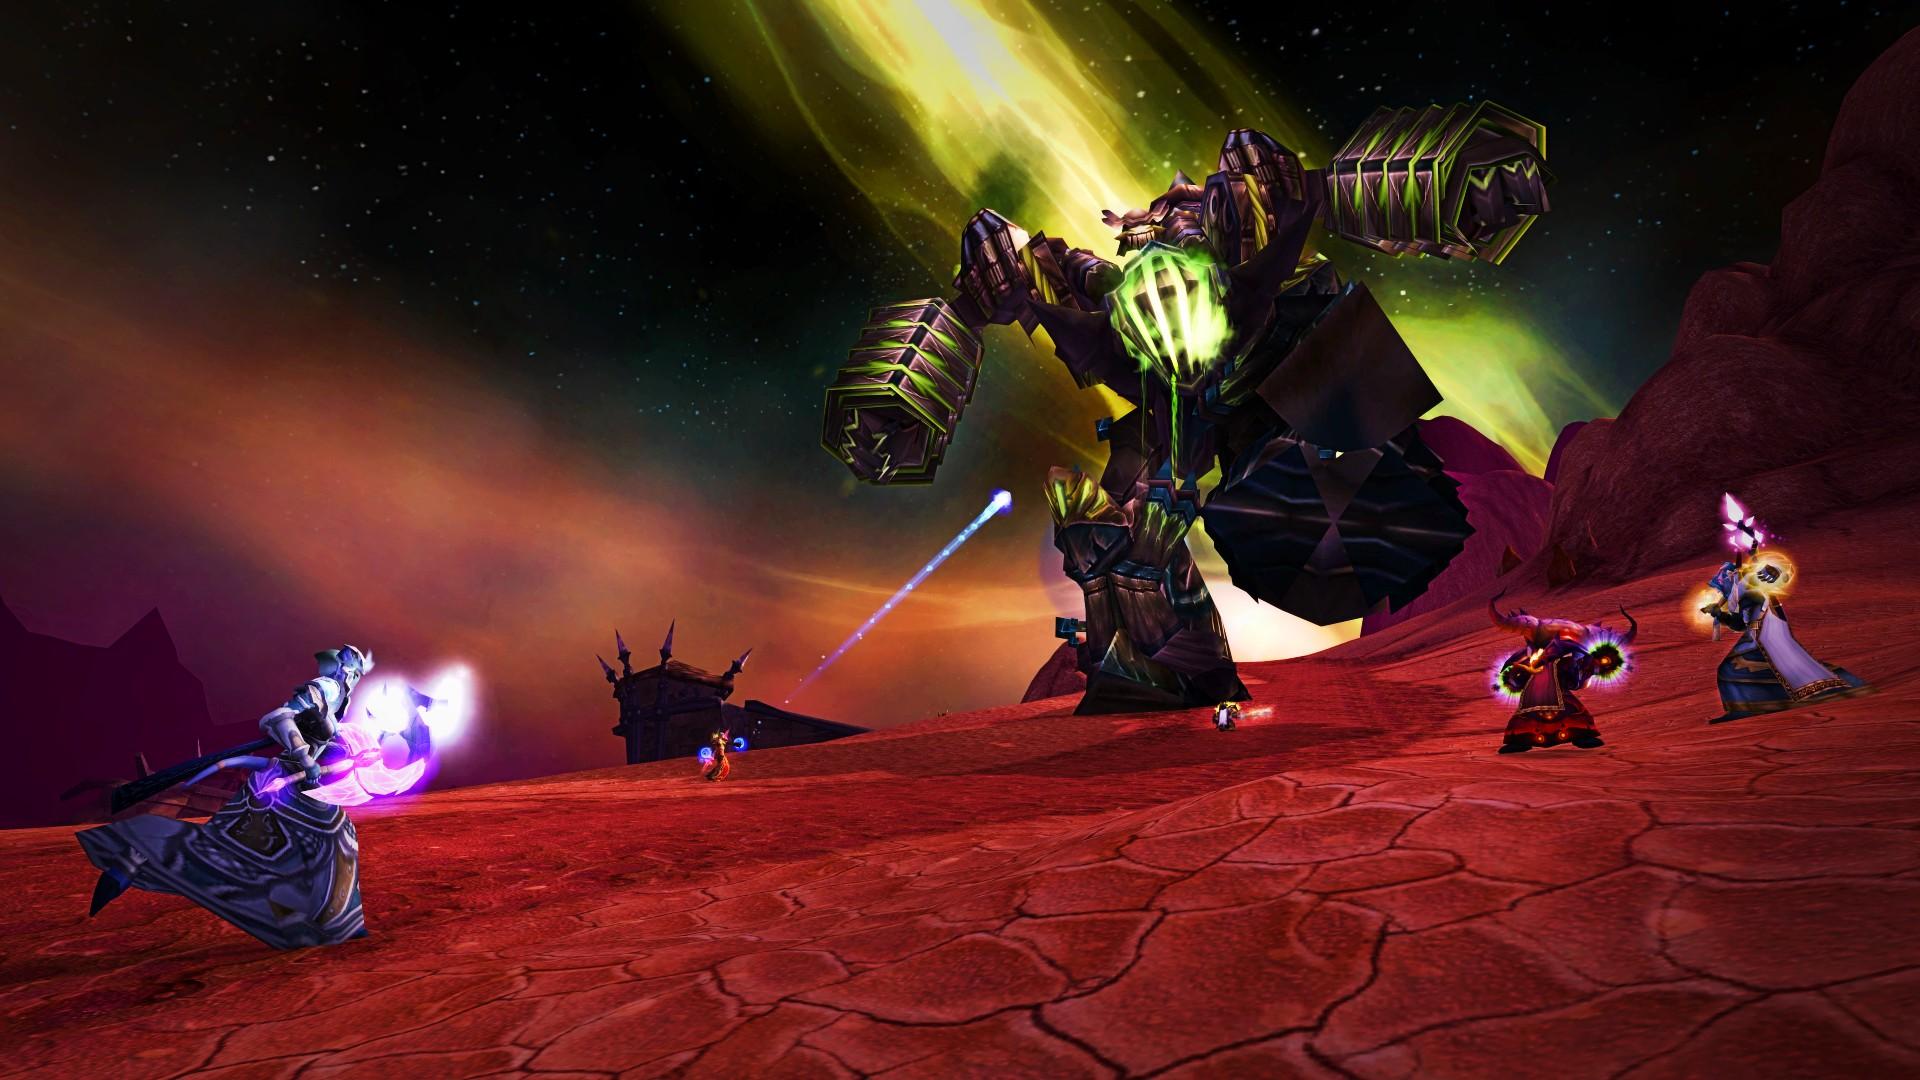 World of Warcraft: Burning Crusade release time confirmed